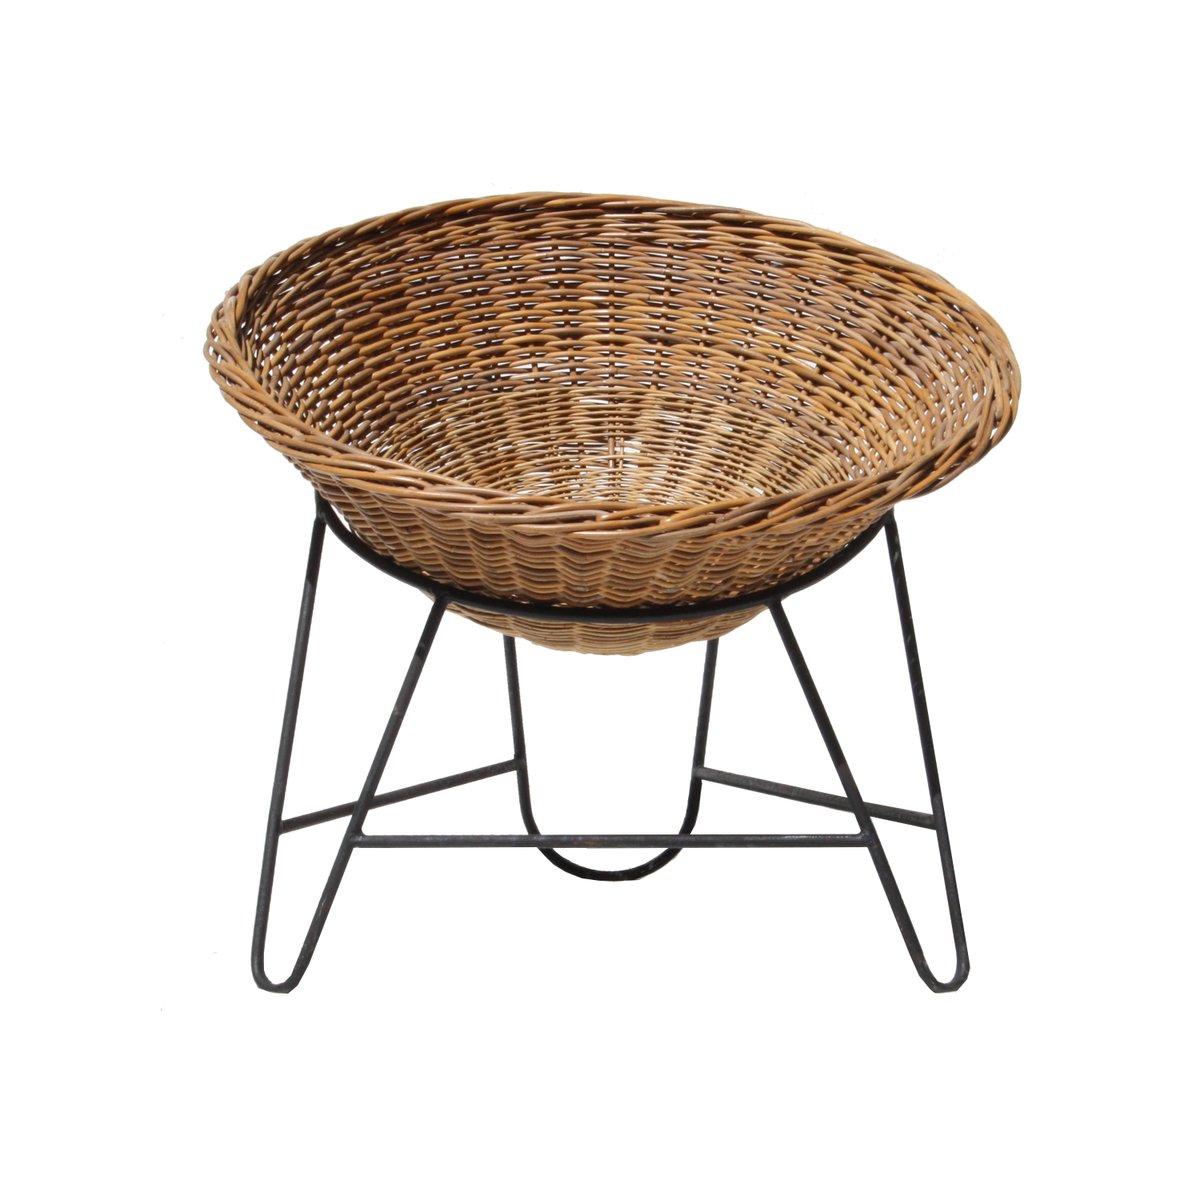 chair local mid modern wicker century basket pickup vintage